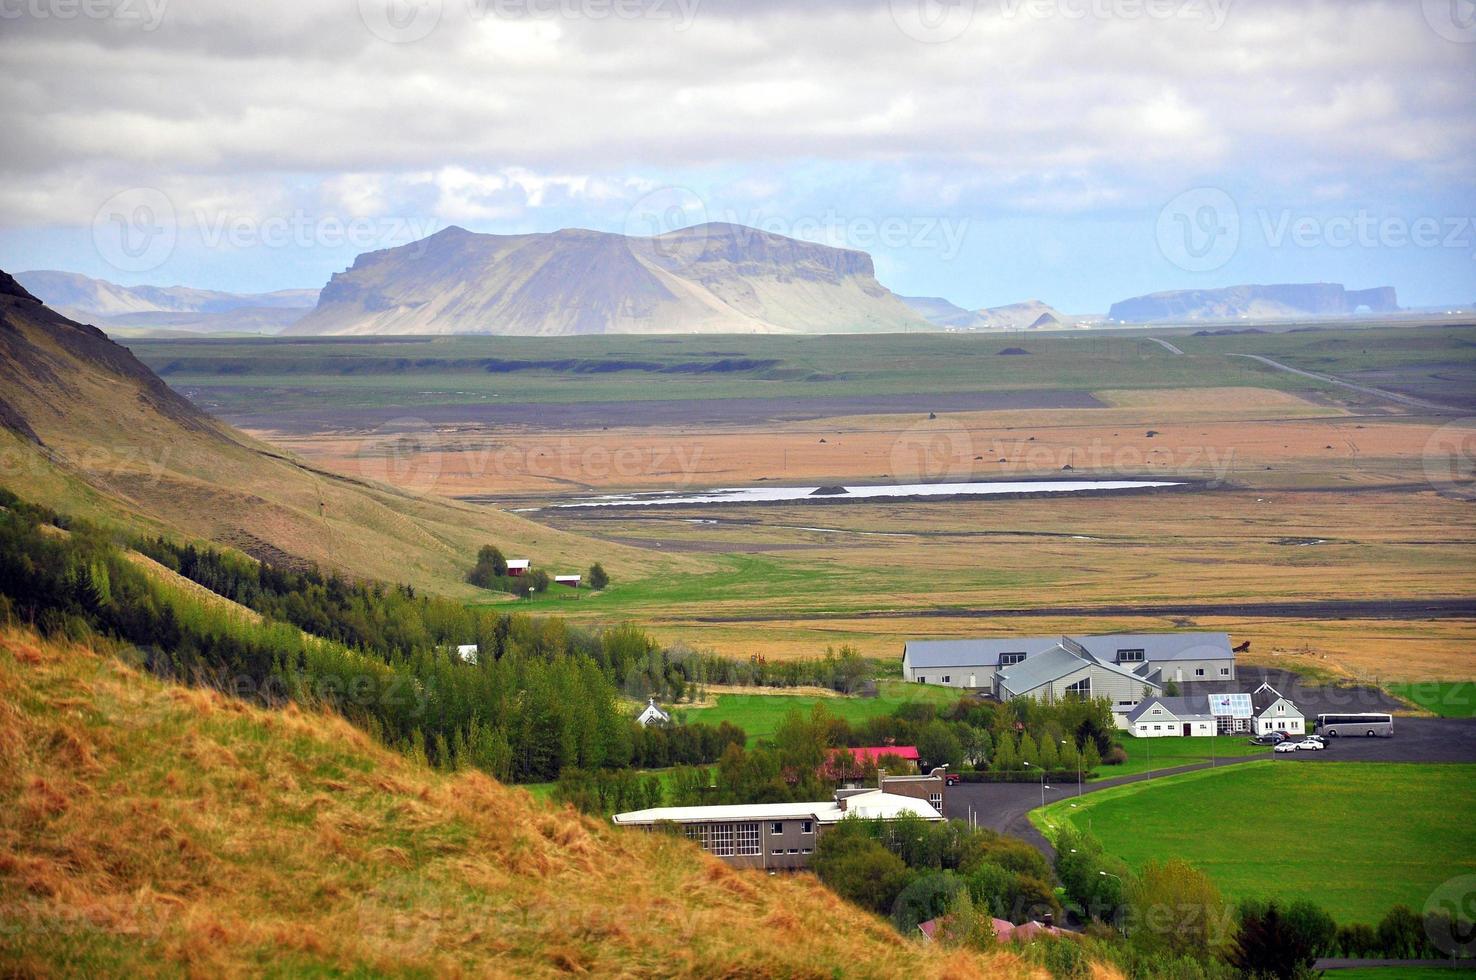 incroyable paysage islandais photo